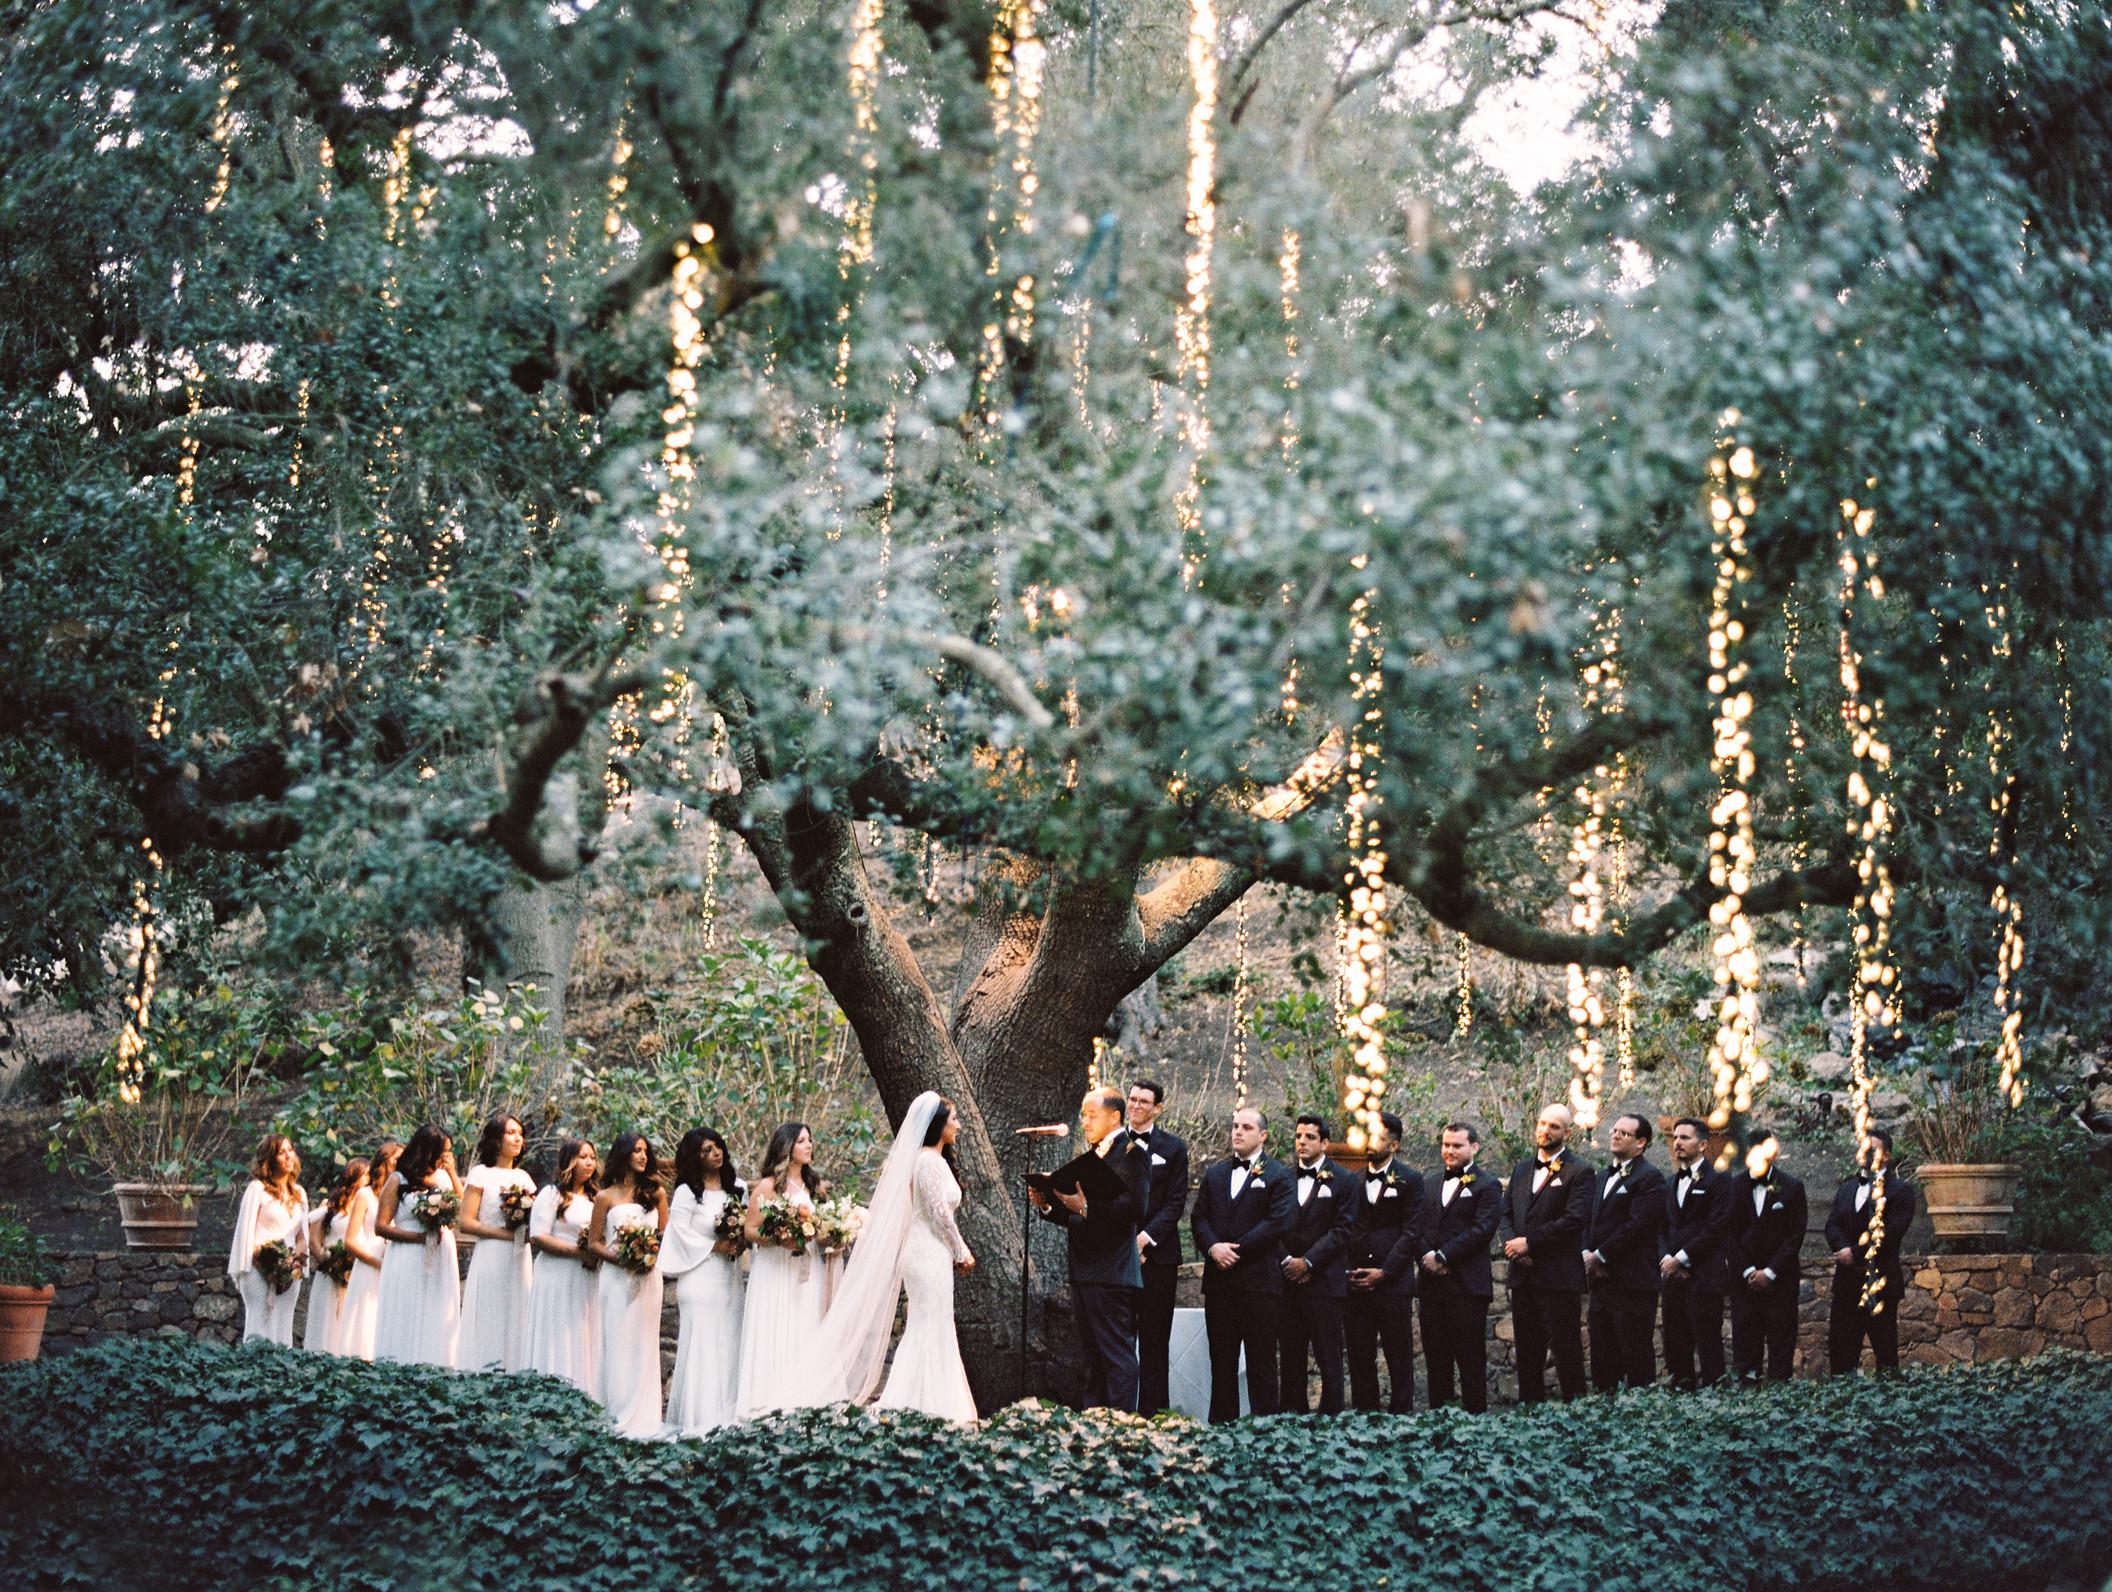 694-fine-art-film-kristopher-veronica-malibu-wedding-brumley-wells-2112x1592.jpg